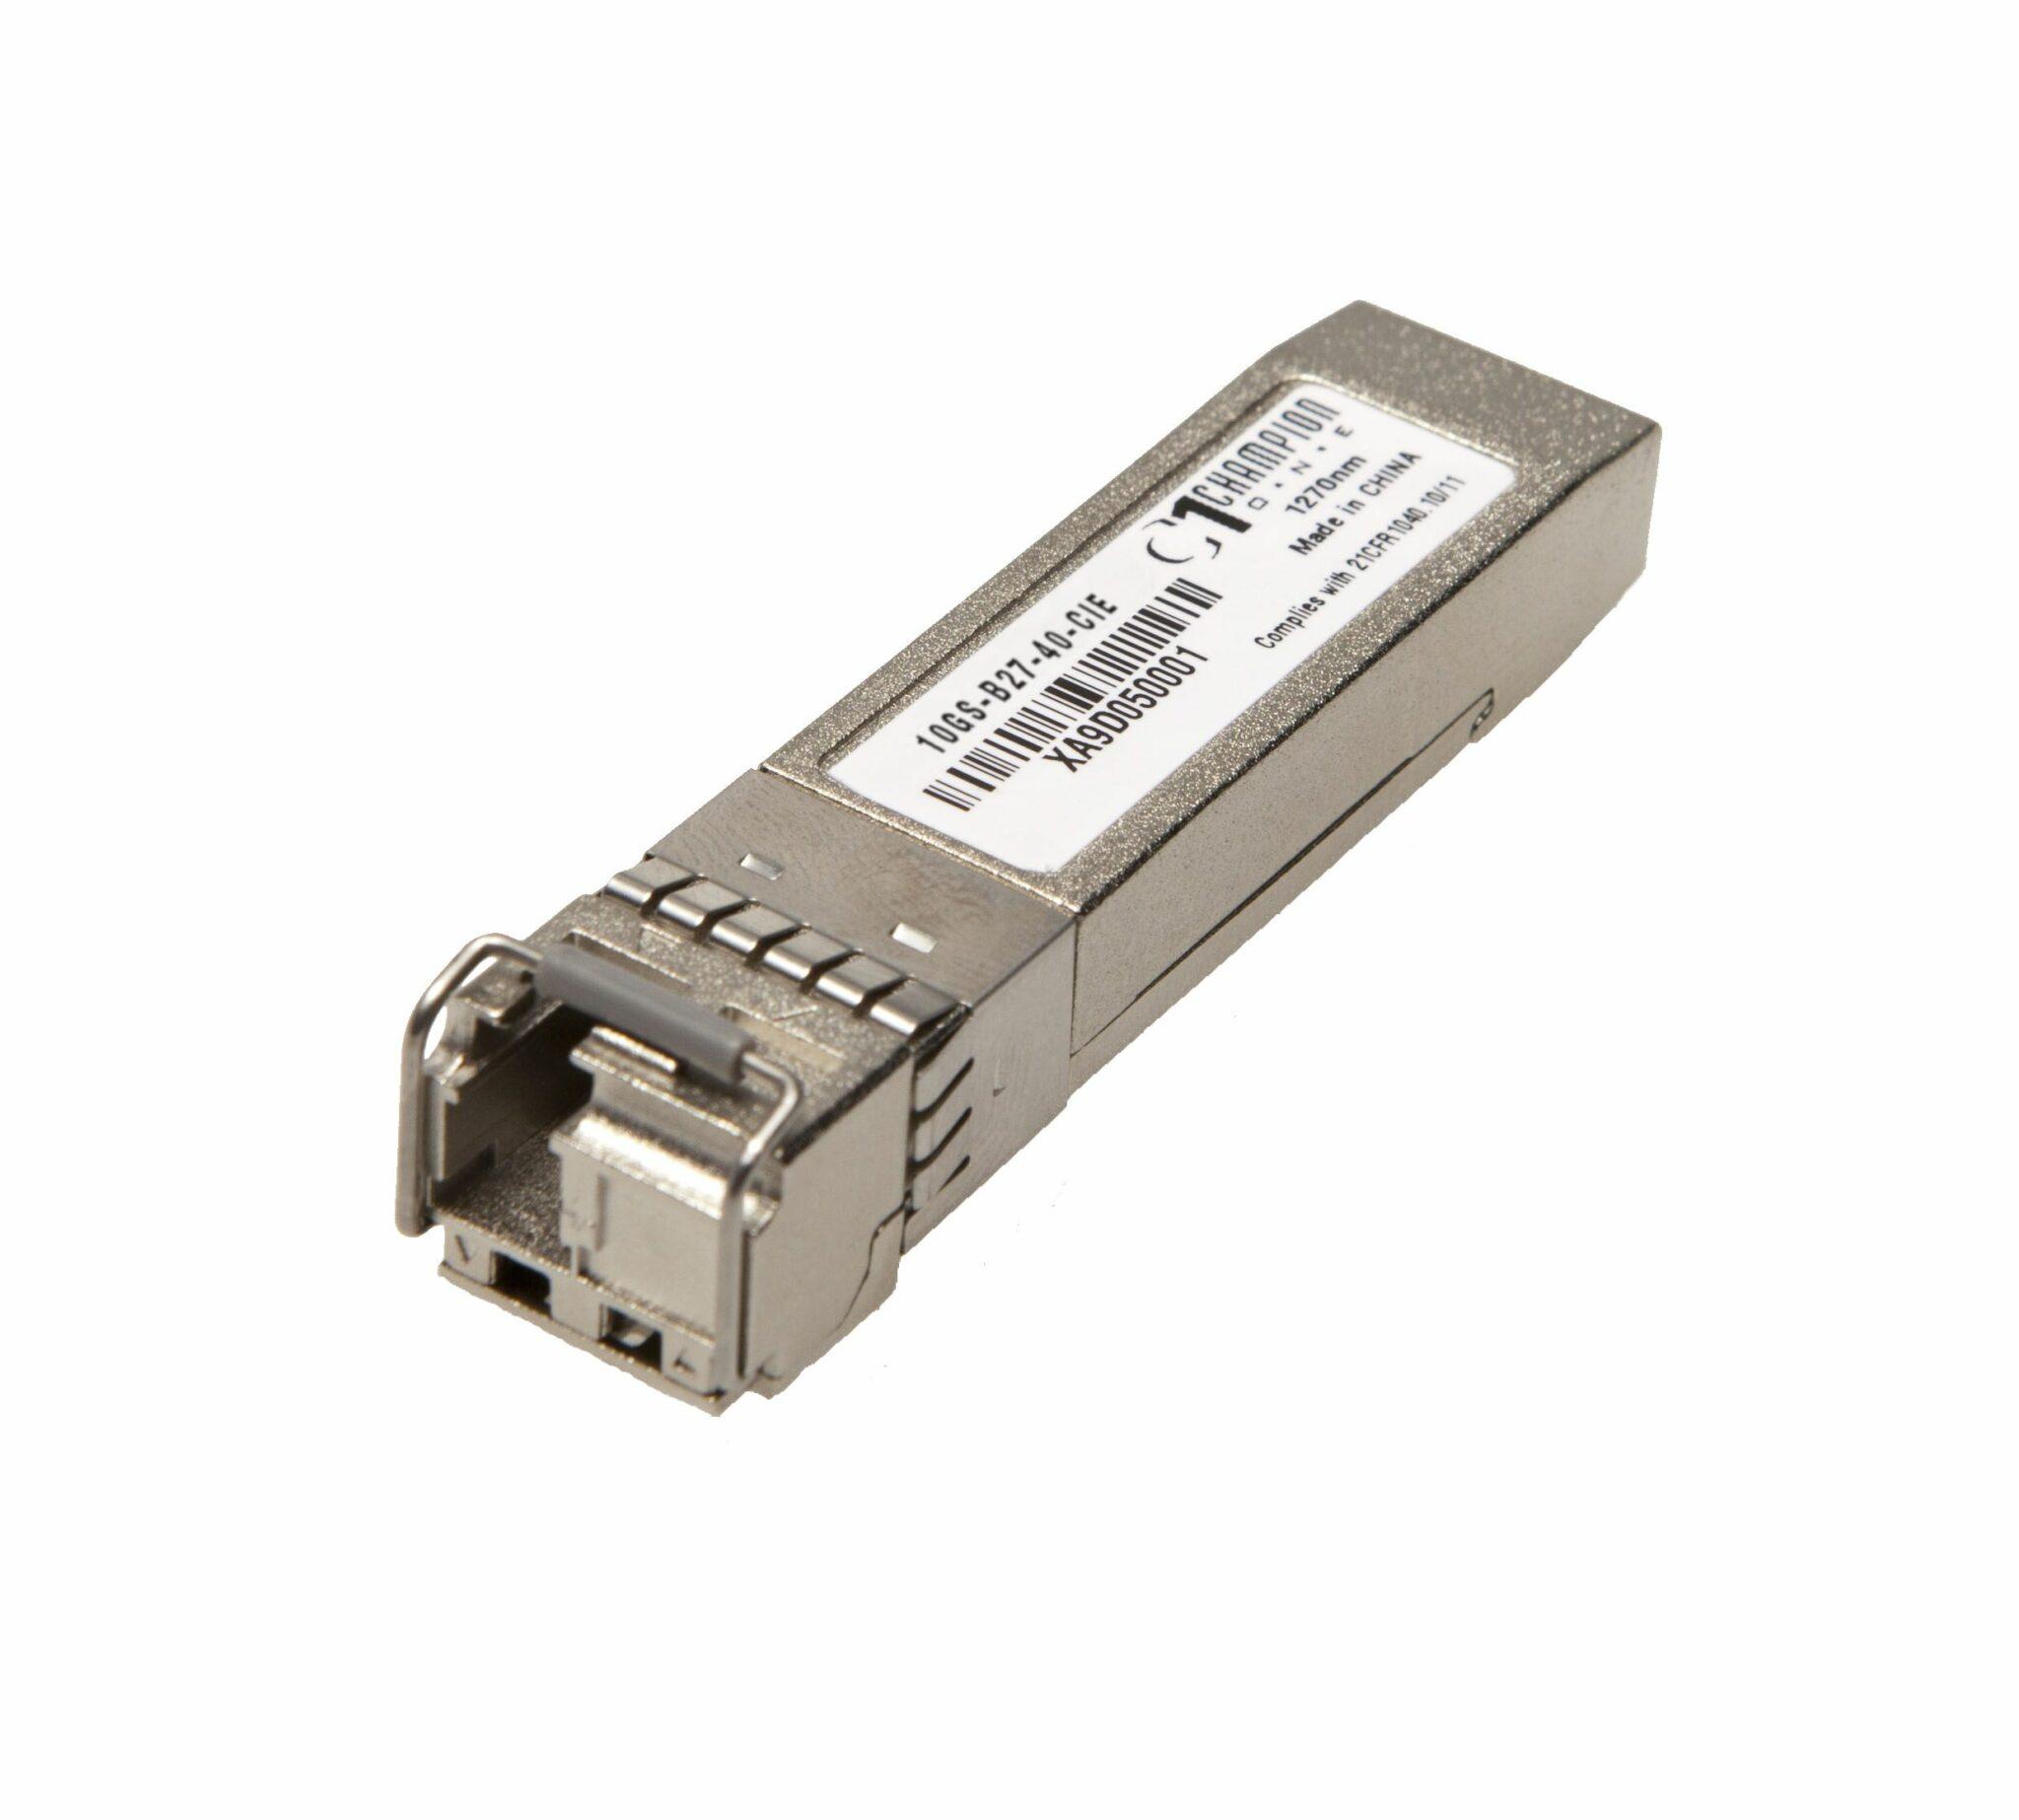 SFP+ SF 10GBase-ER 1270nm 40km, Ciena compatible